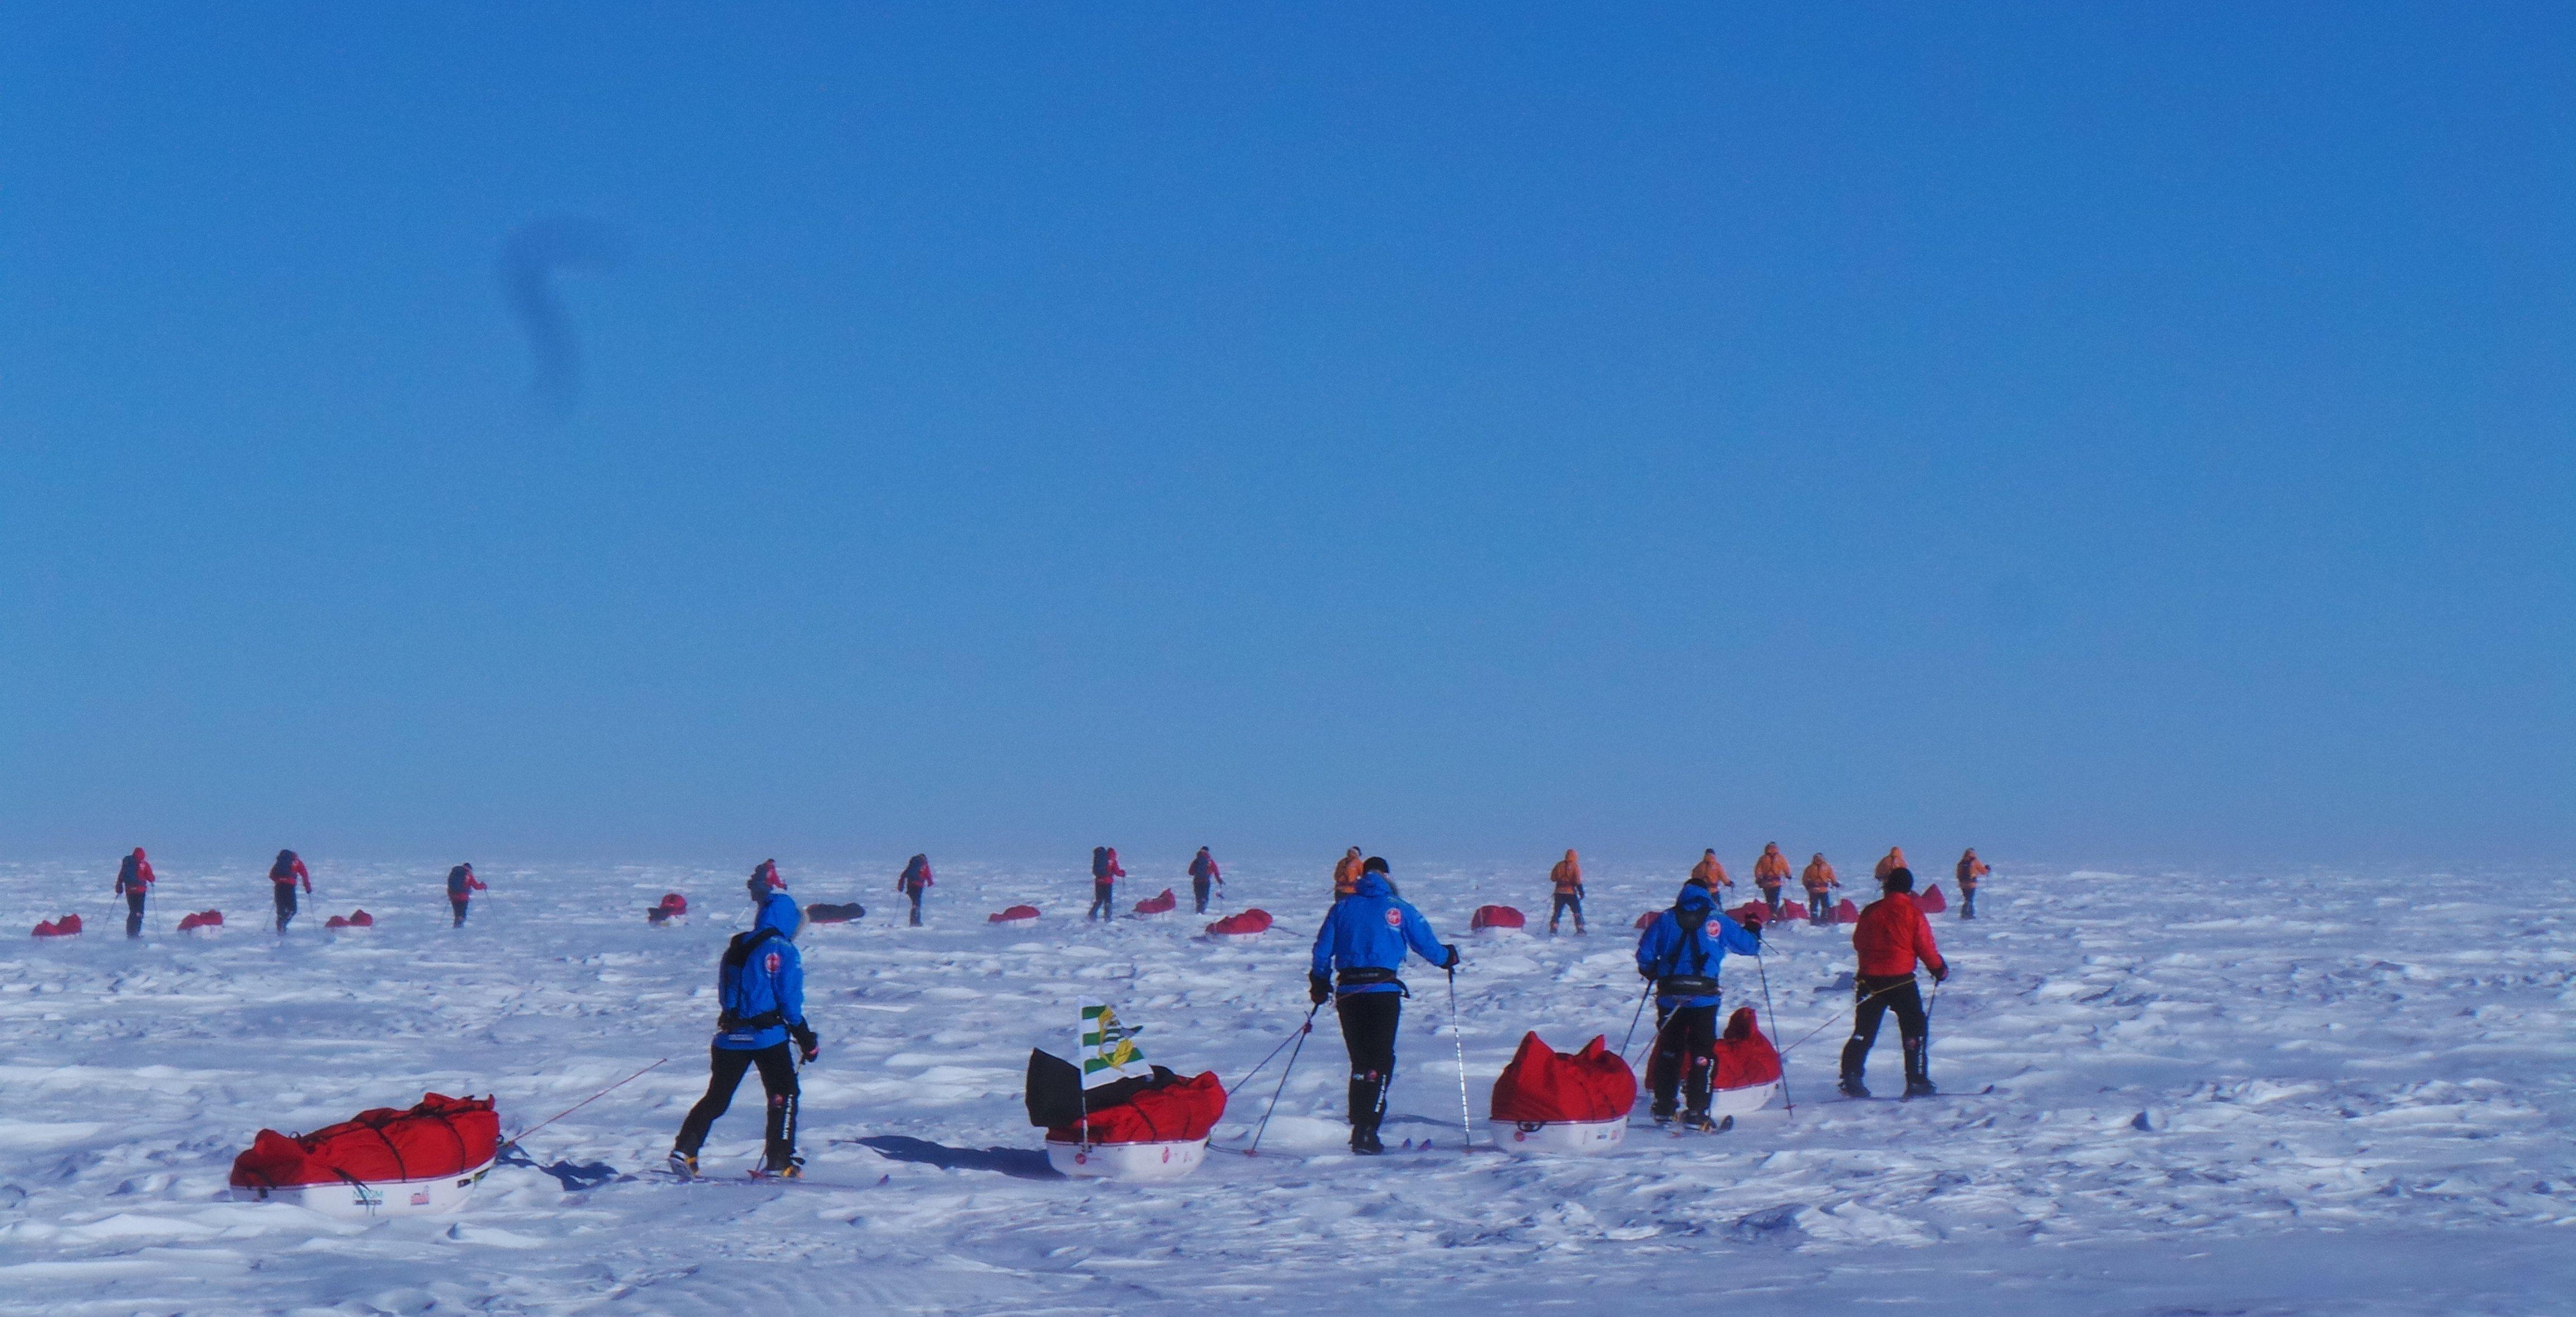 Day 2 – Teams face Sastrugi fields